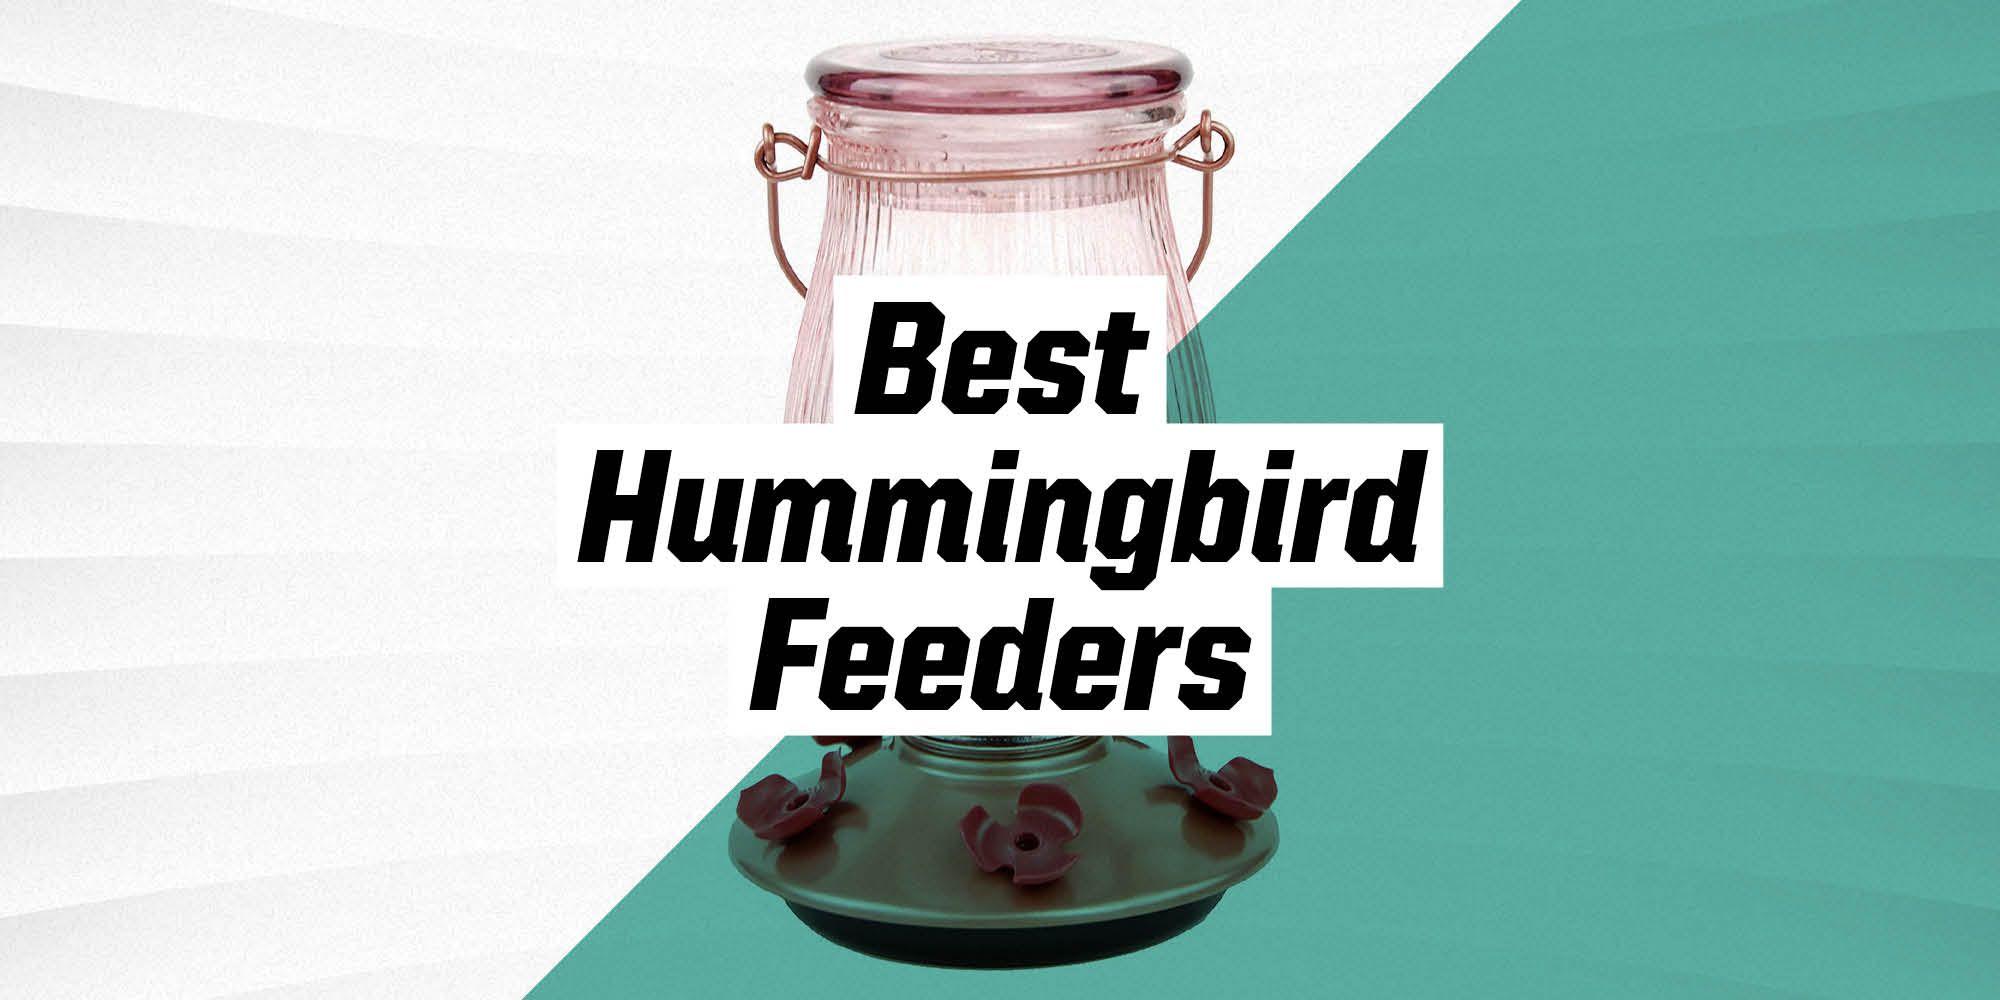 10 Best Hummingbird Feeders to Create a Mini Paradise